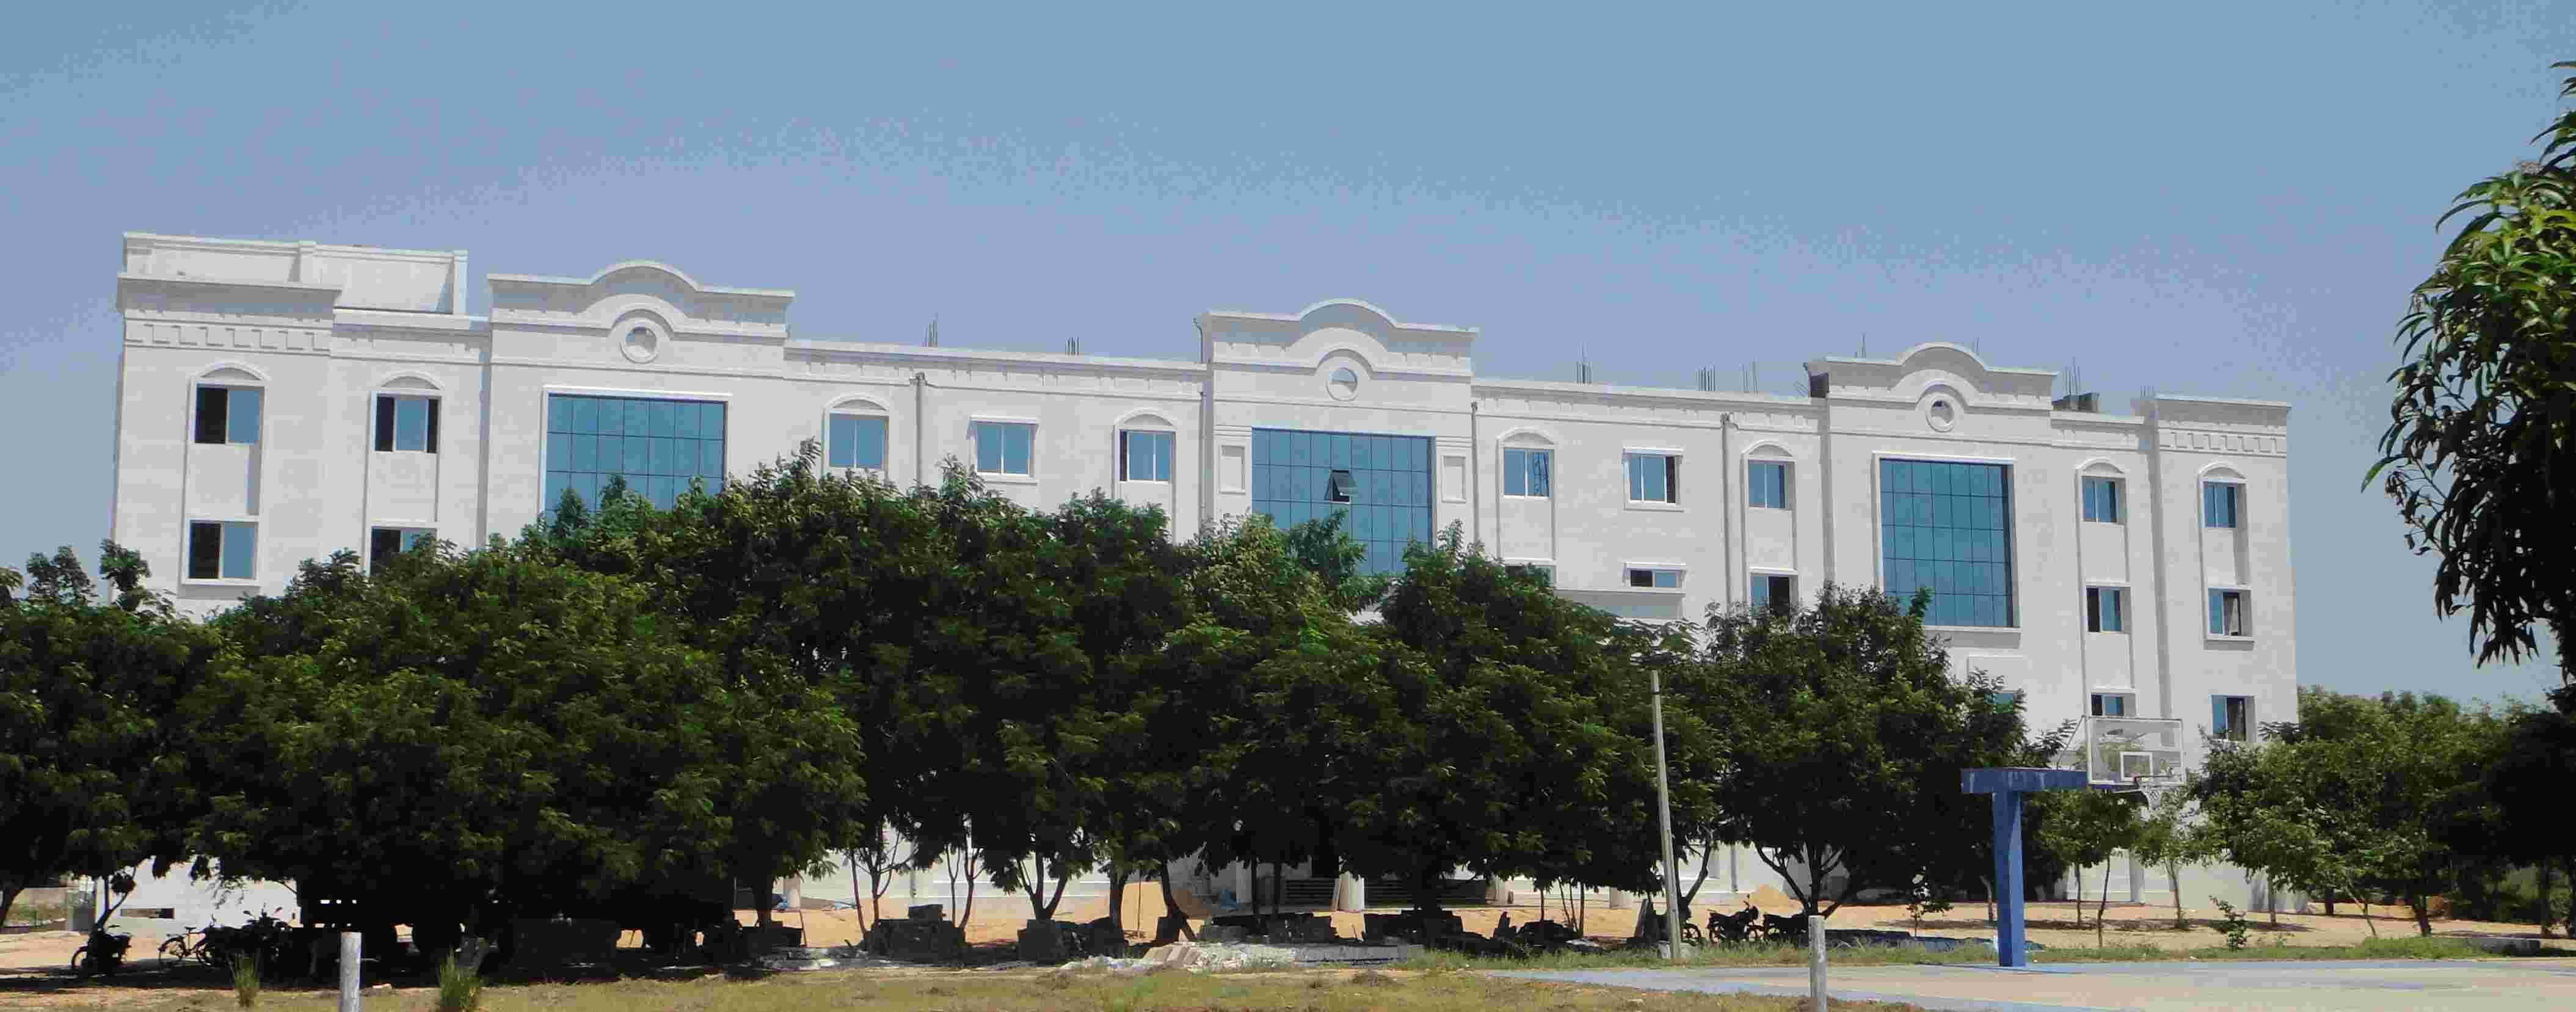 Annamacharya PG College of Computer Studies in andhra pradesh